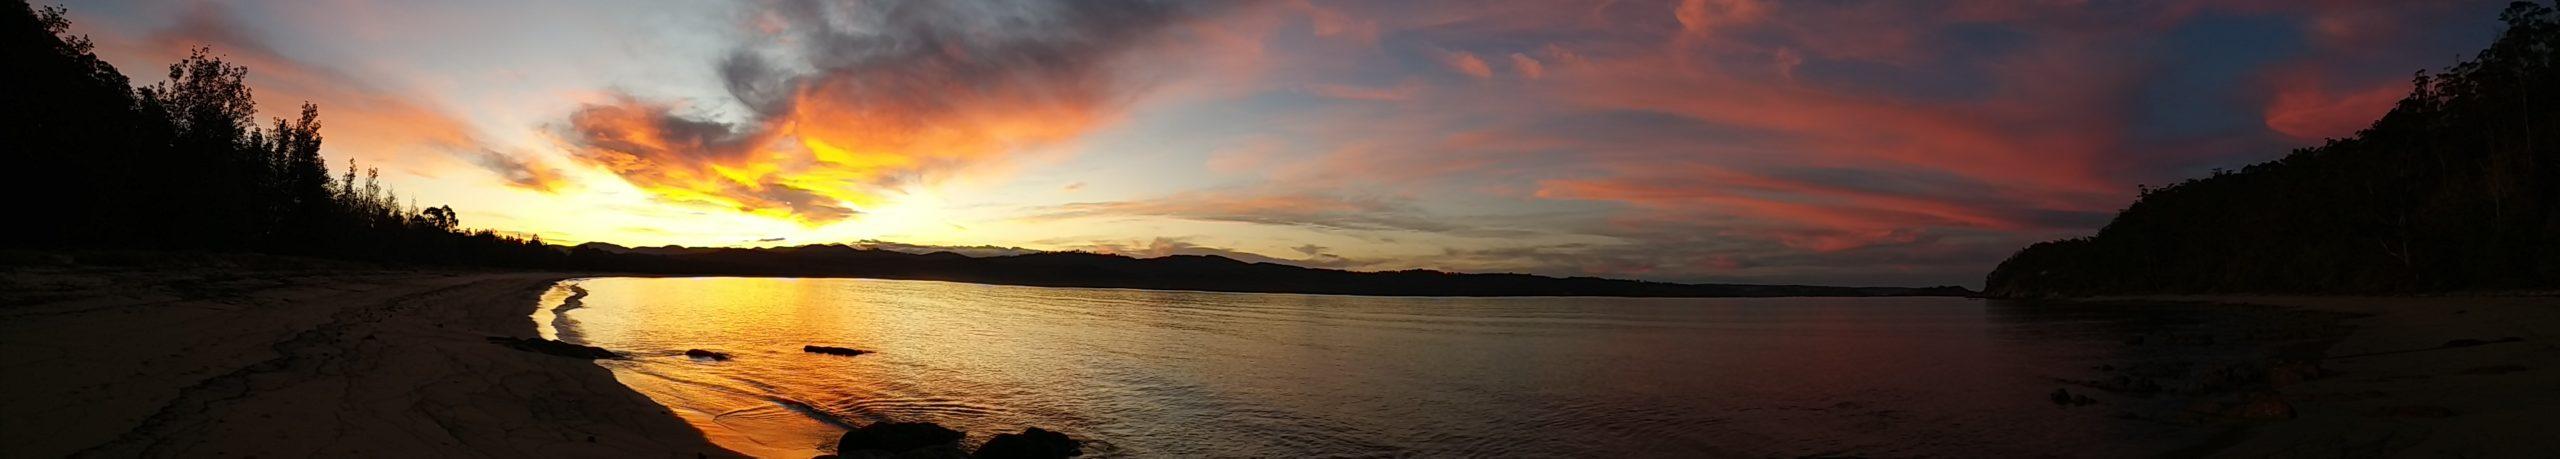 Sunset at Boydtown Bay